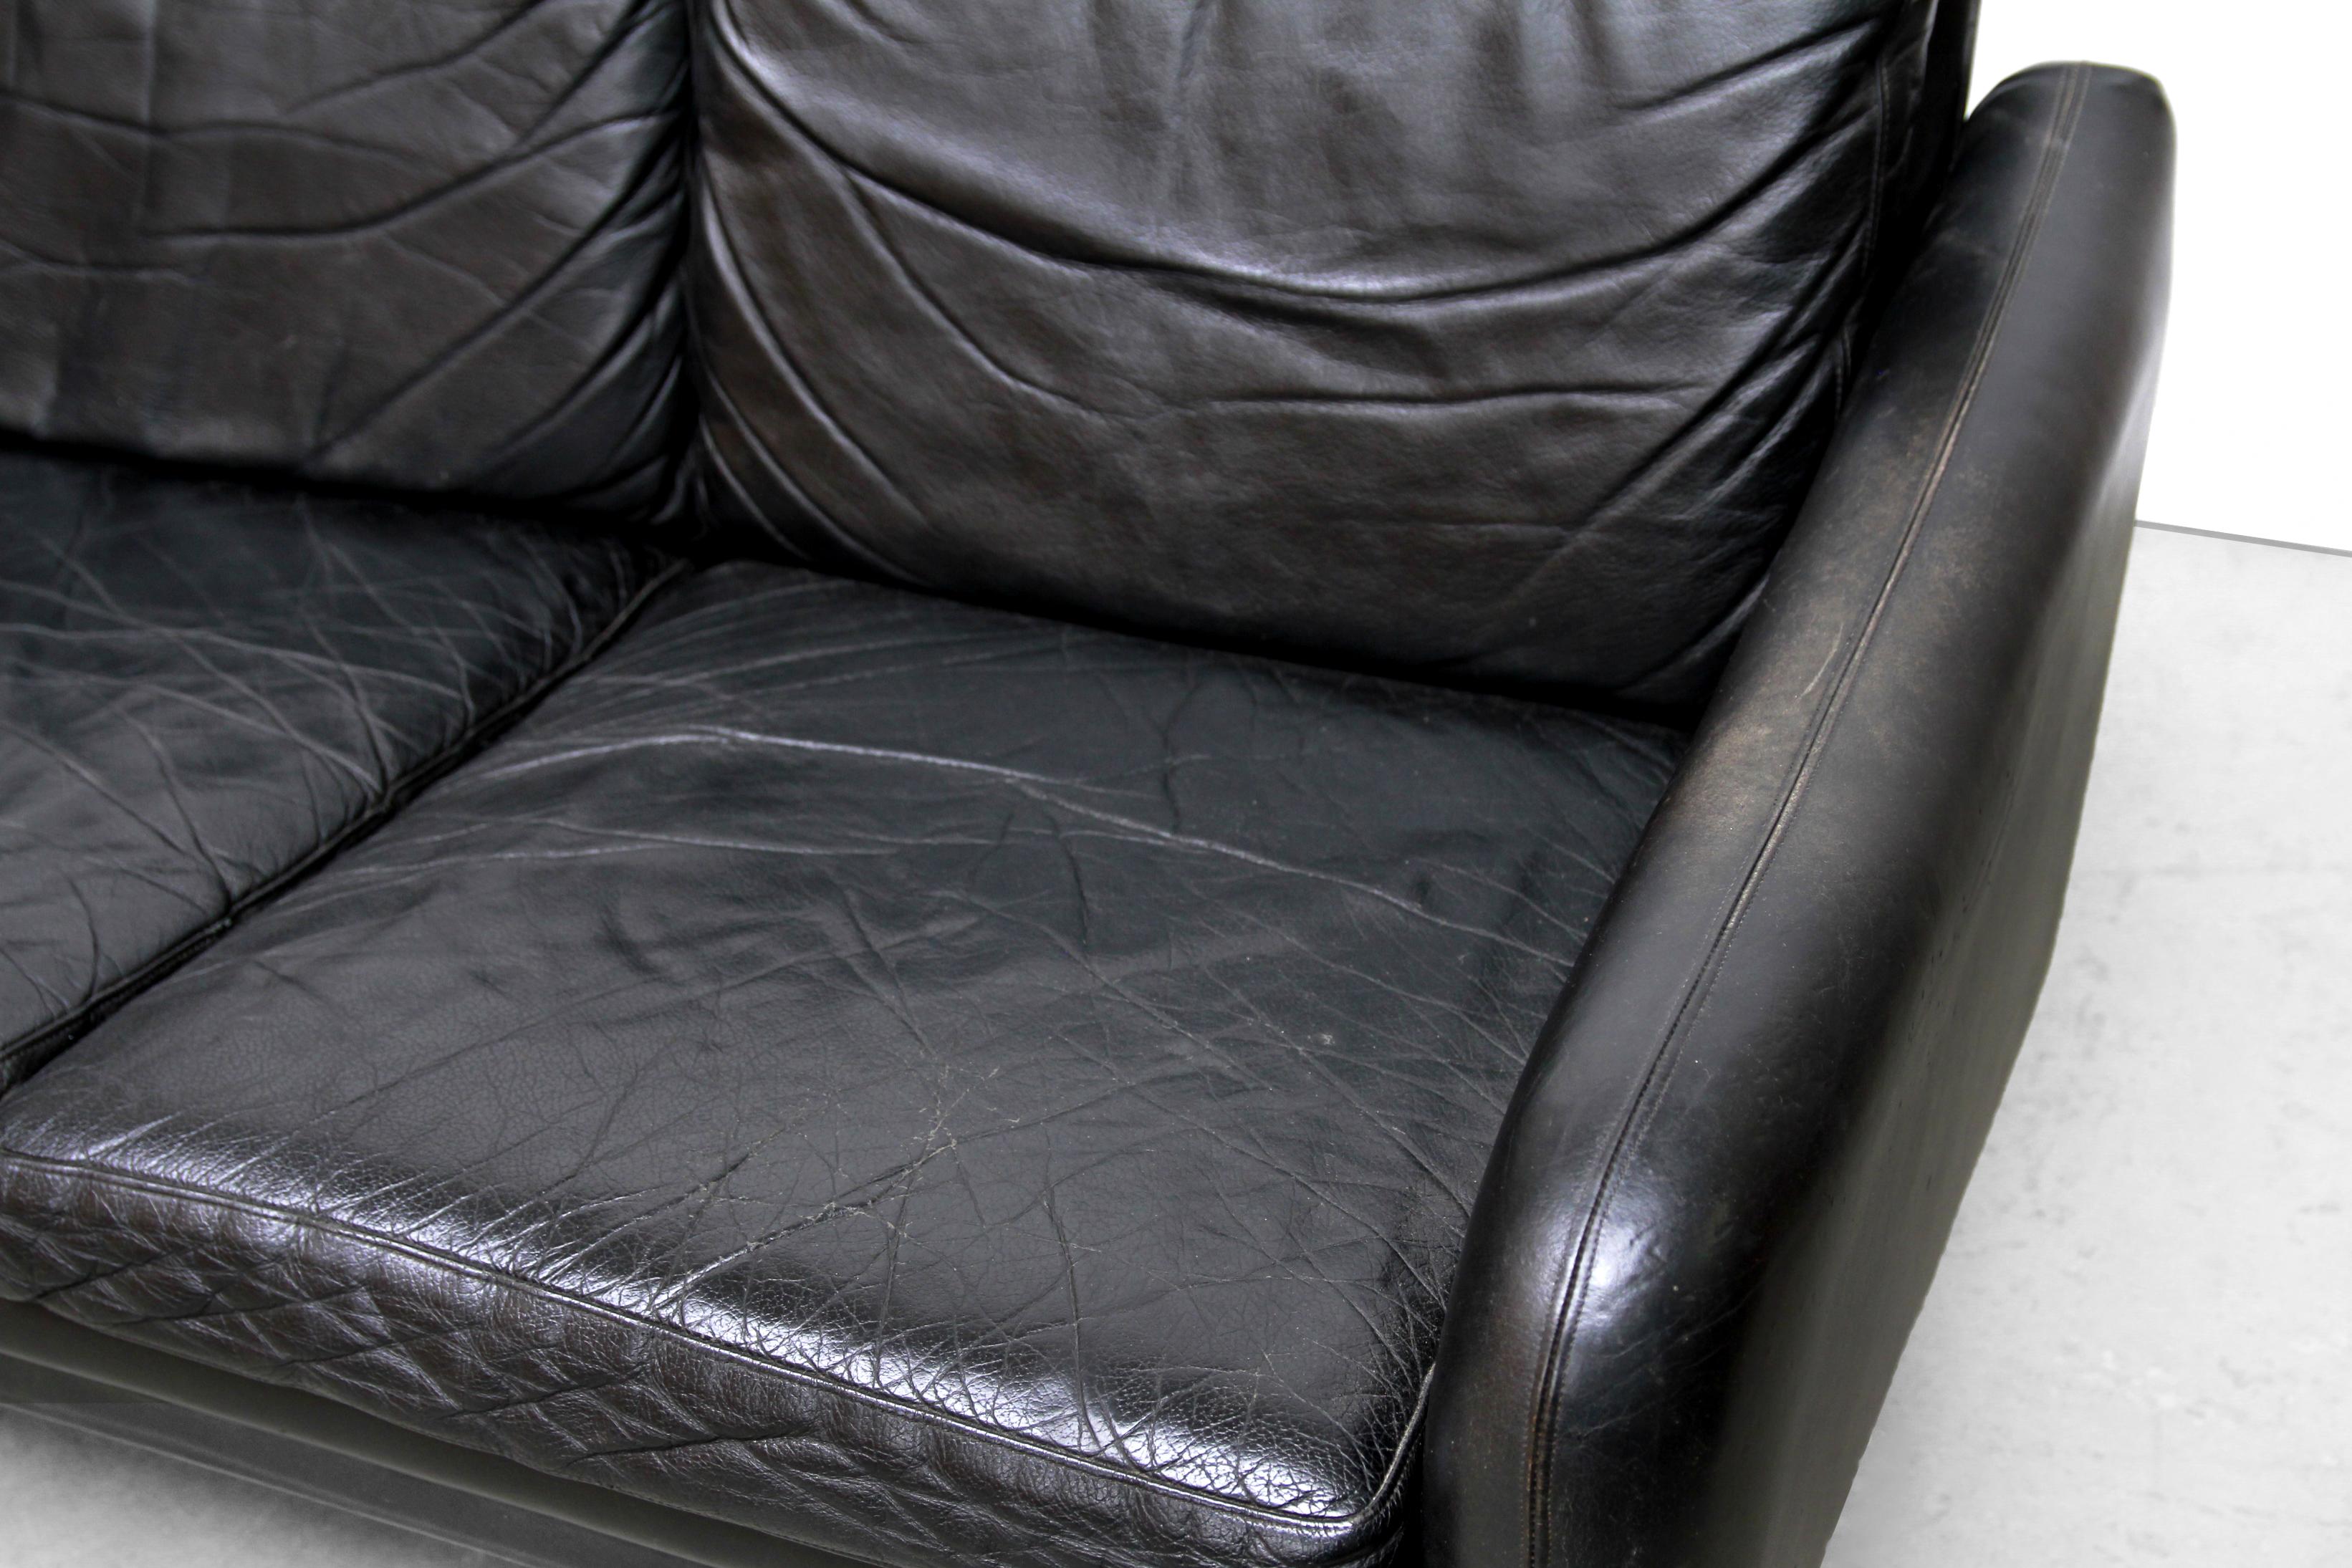 Zwart Leren Bankstel Design.Zwart Leren Vintage Deens Design Bank Black Leather Design Sofa